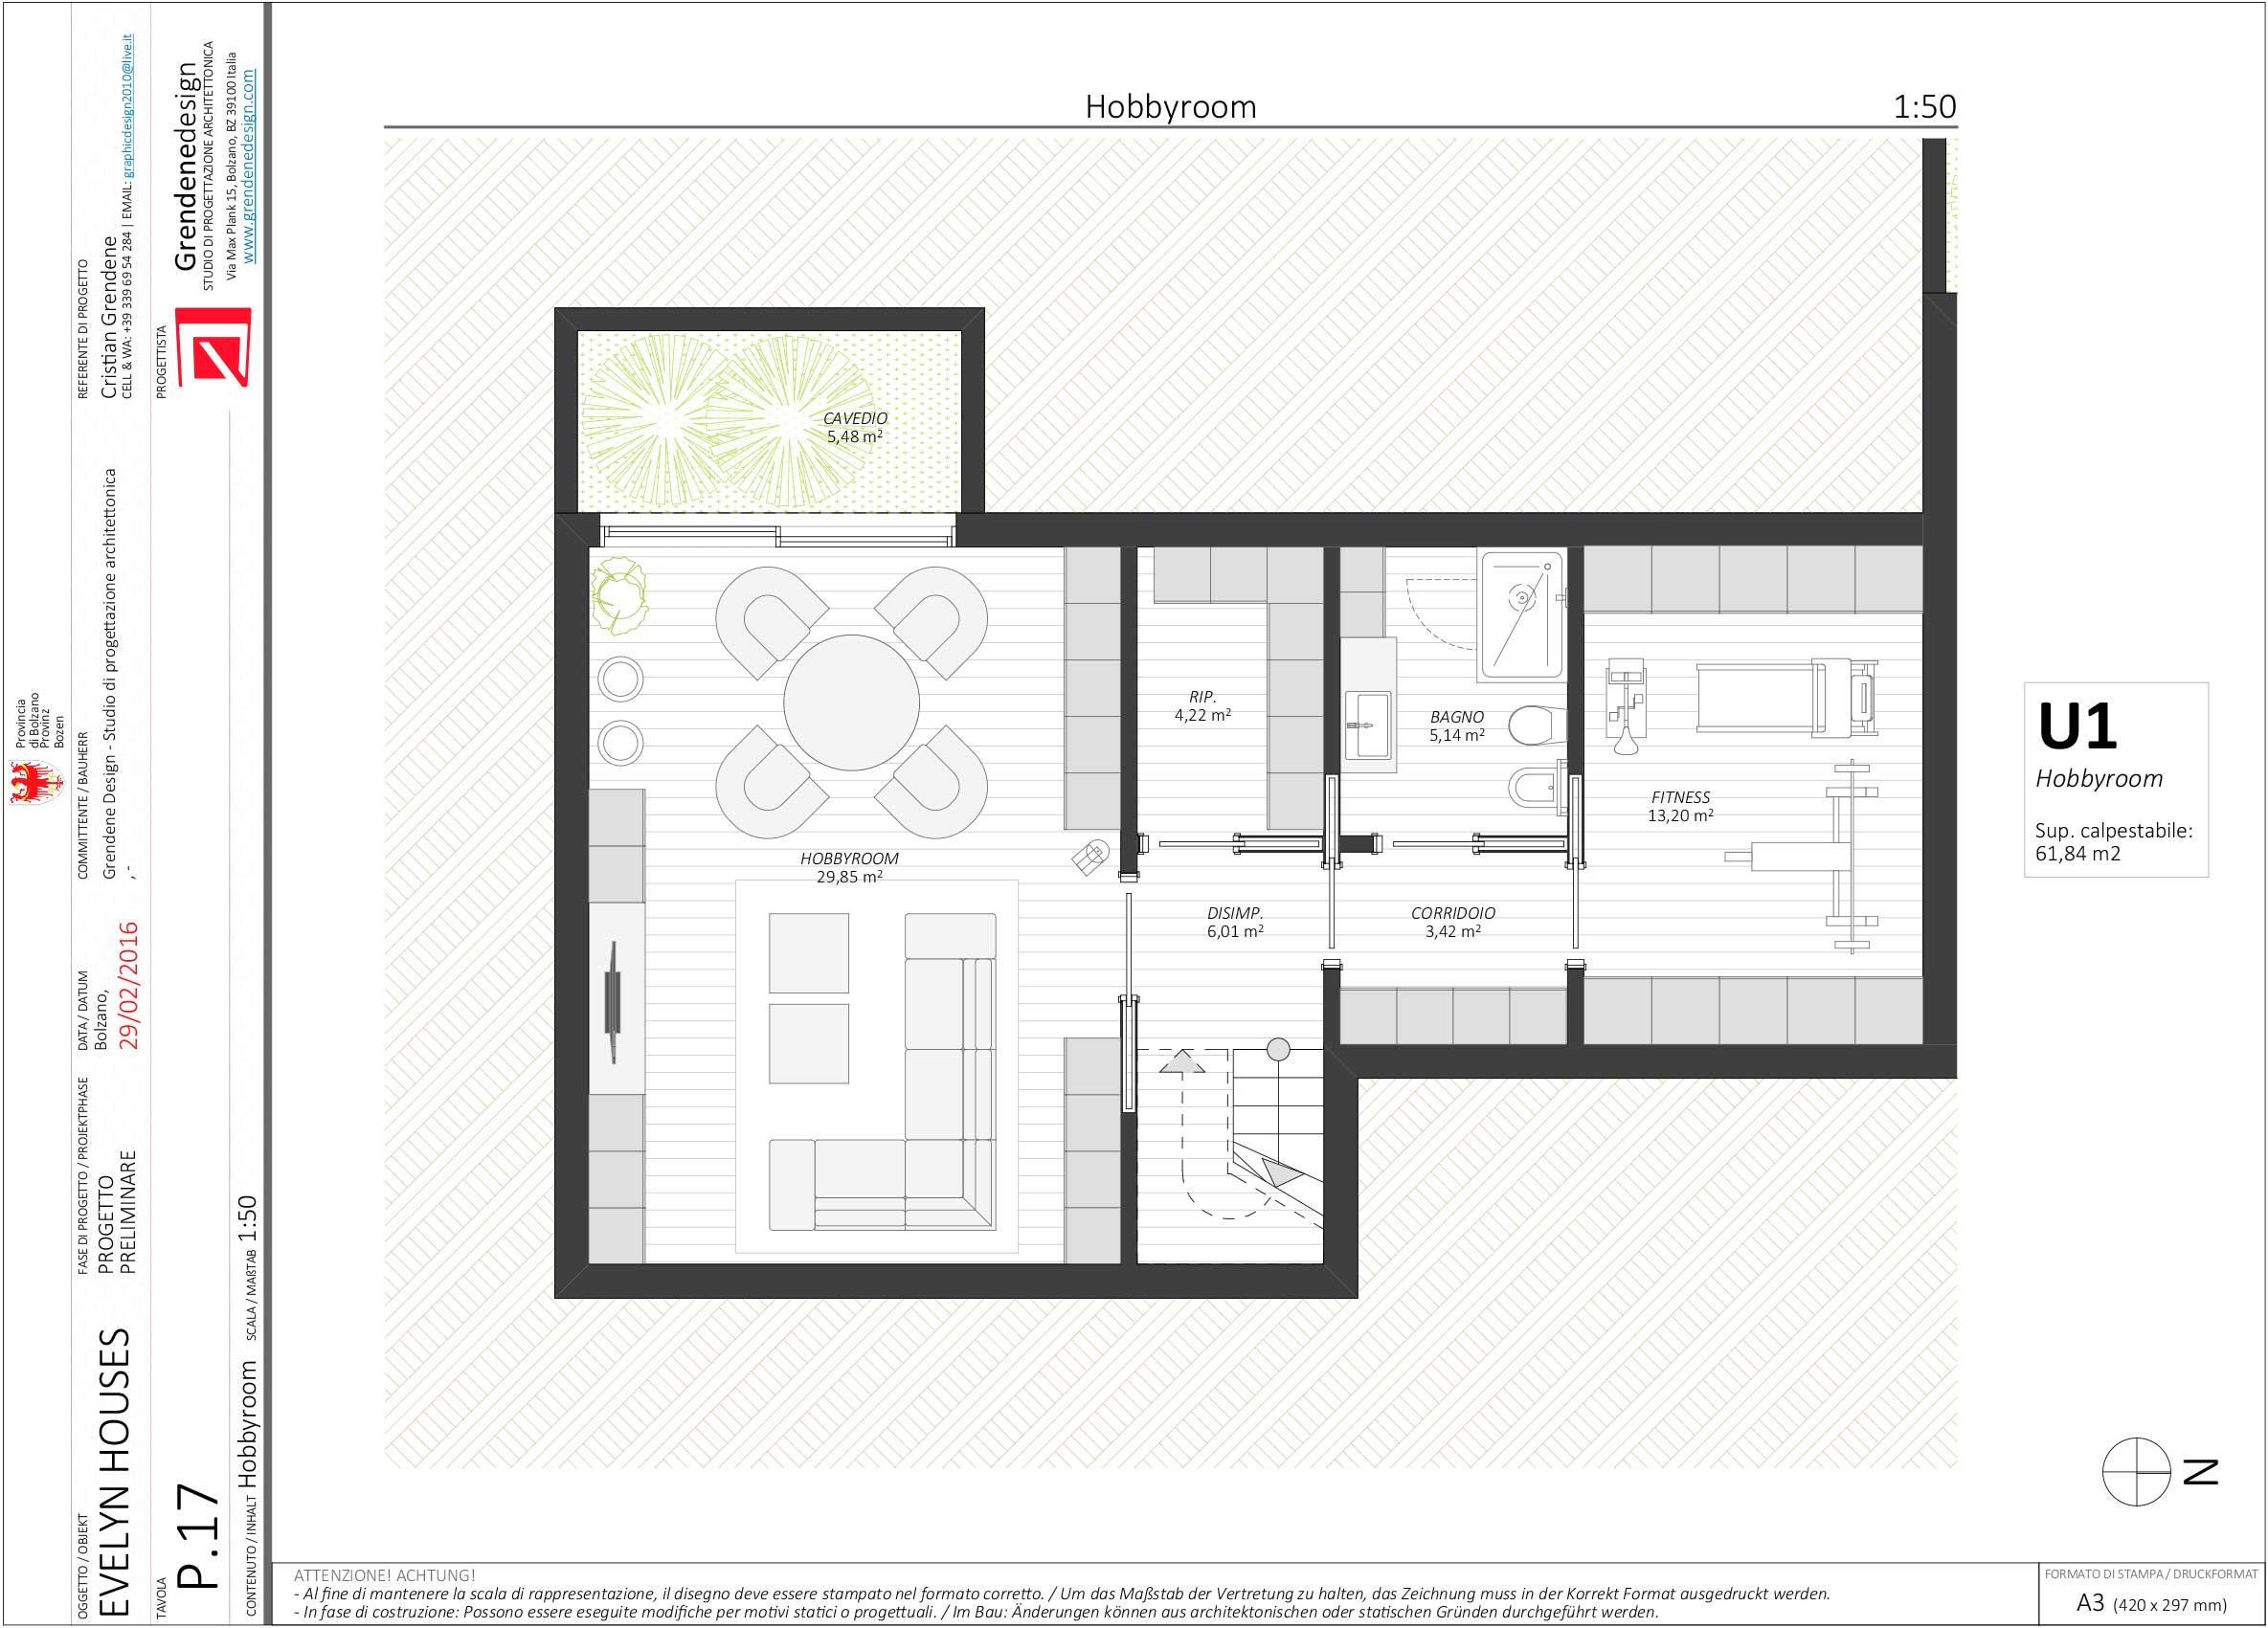 UNITA' 1 - Hobbyroom